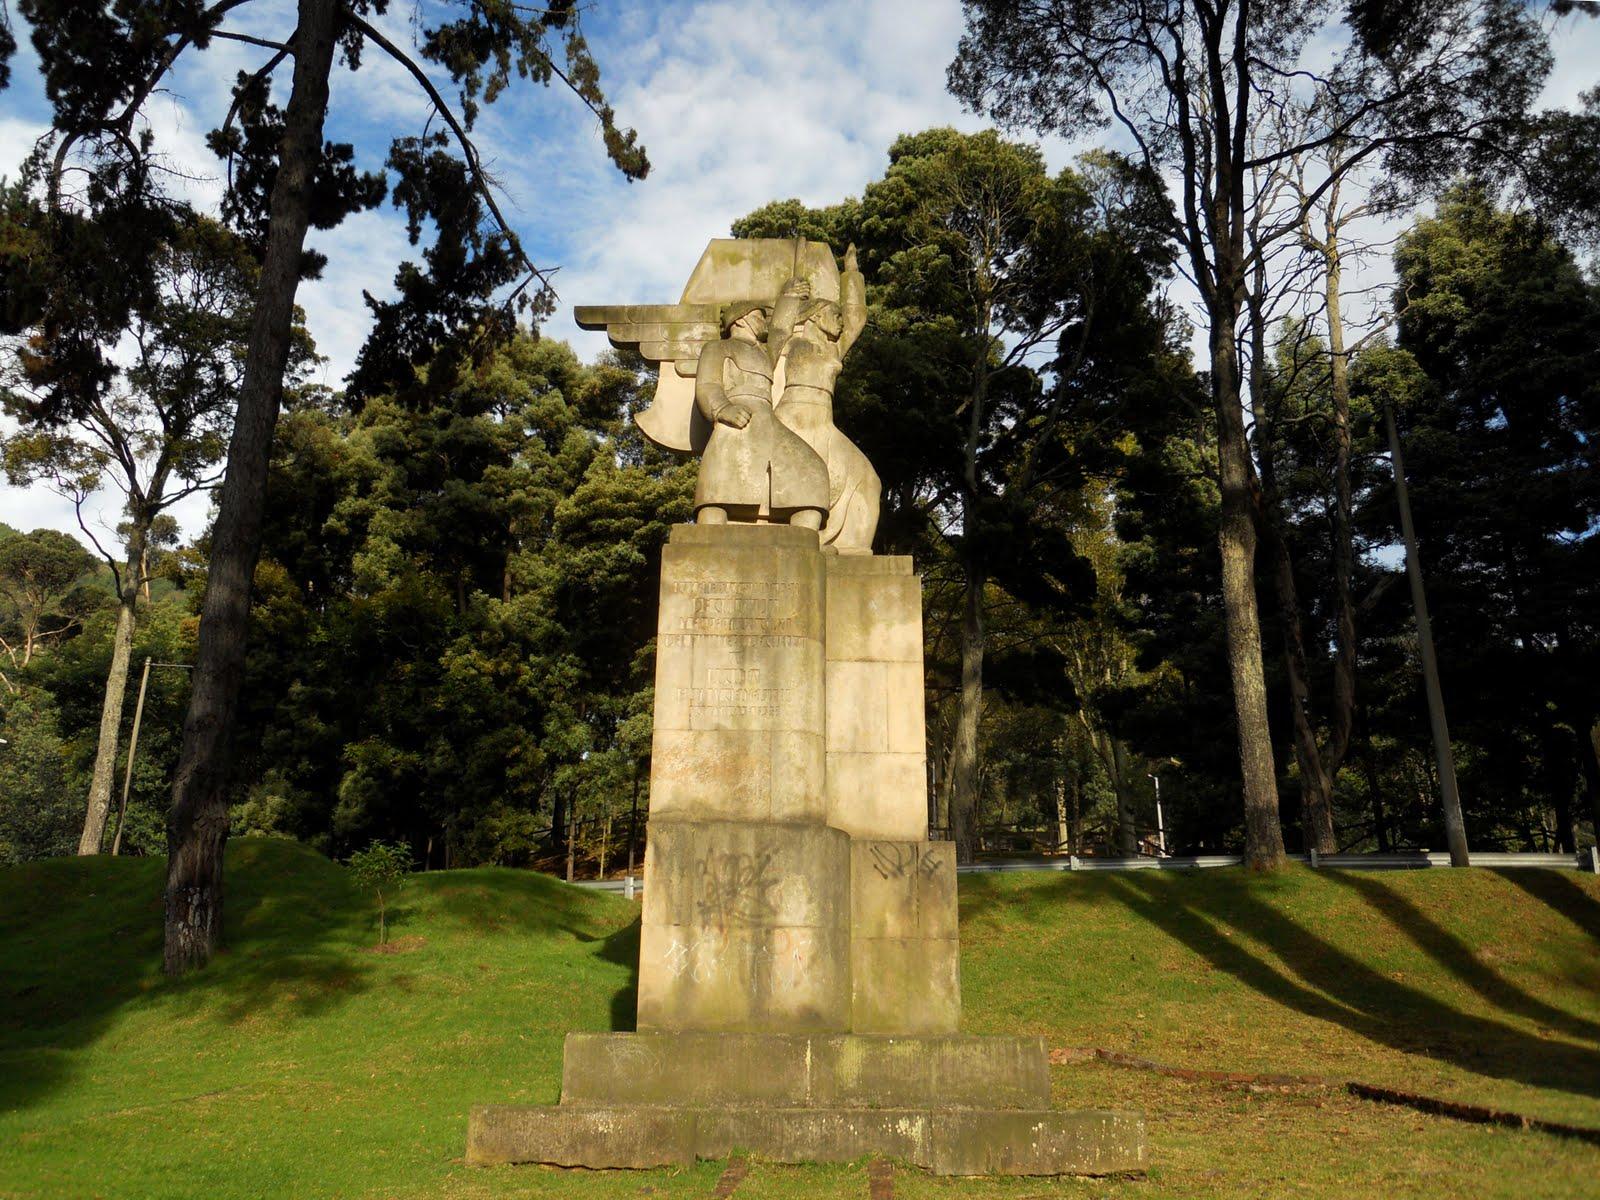 Monumento parte 1 - 3 7